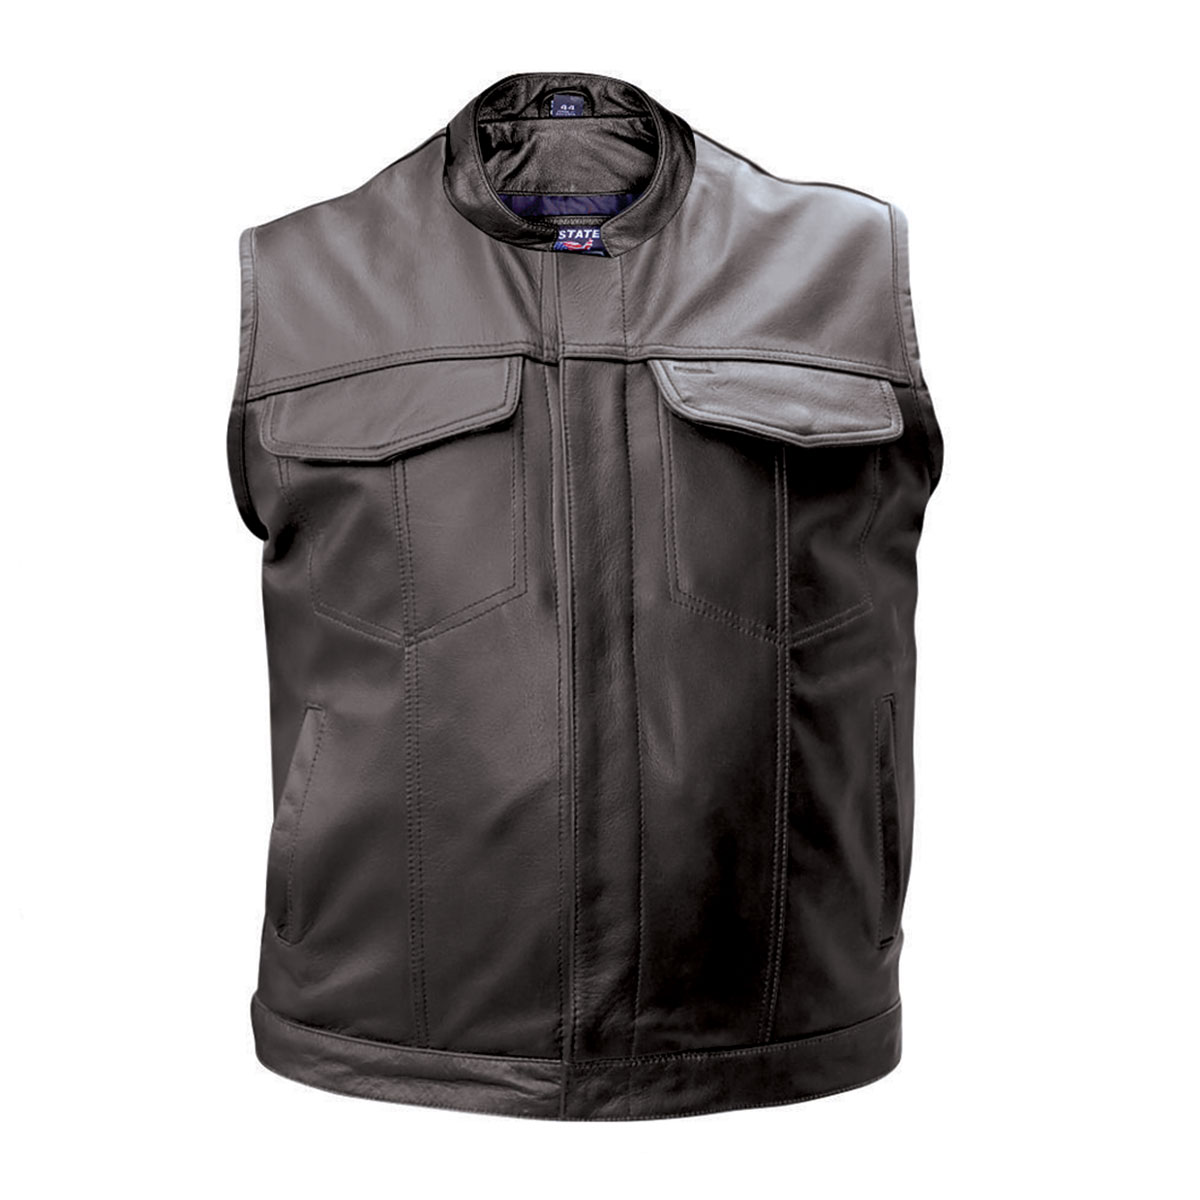 Allstate Leather Inc. Men's Concealed Carry Leather Vest